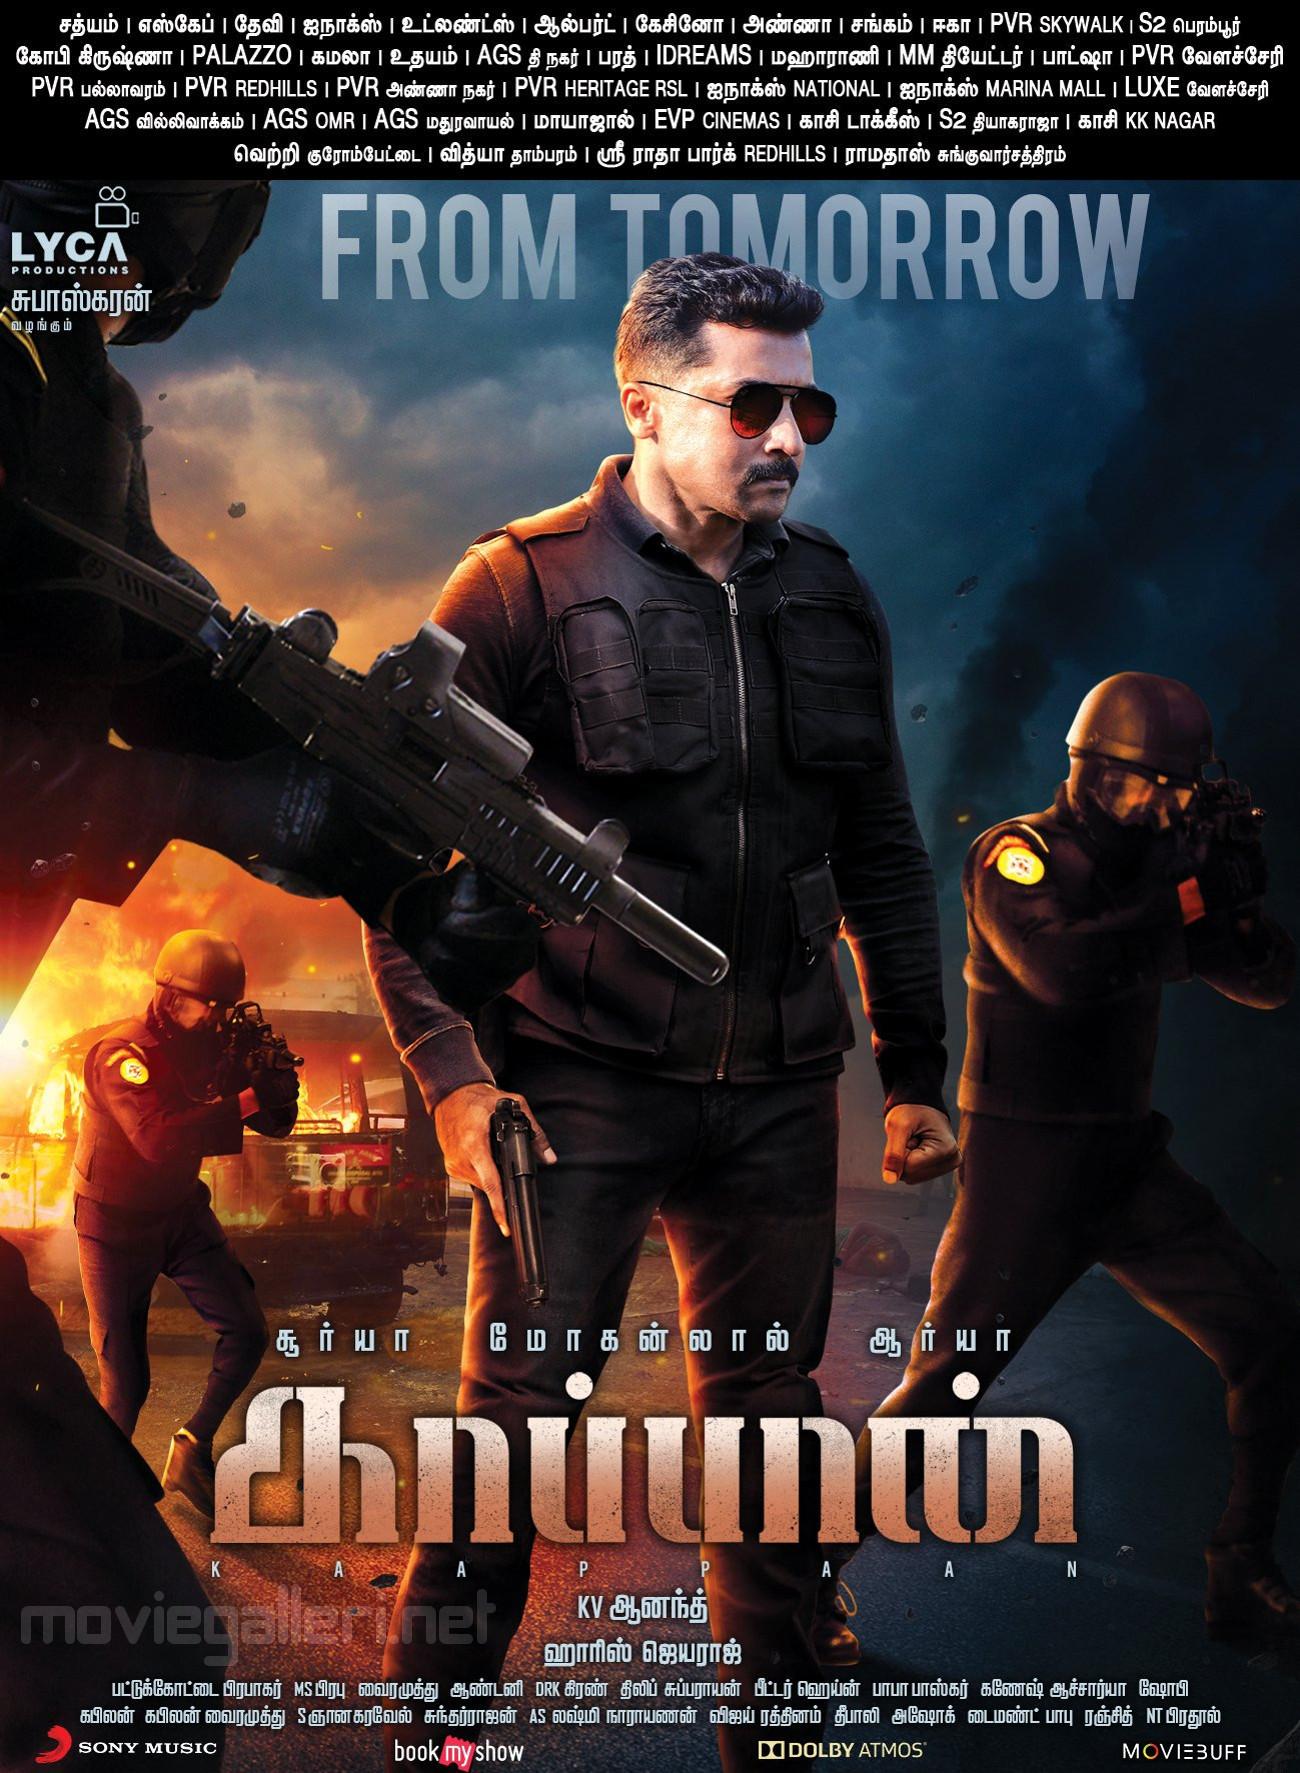 Suriya Kaappaan Movie from Tomorrow Posters HD